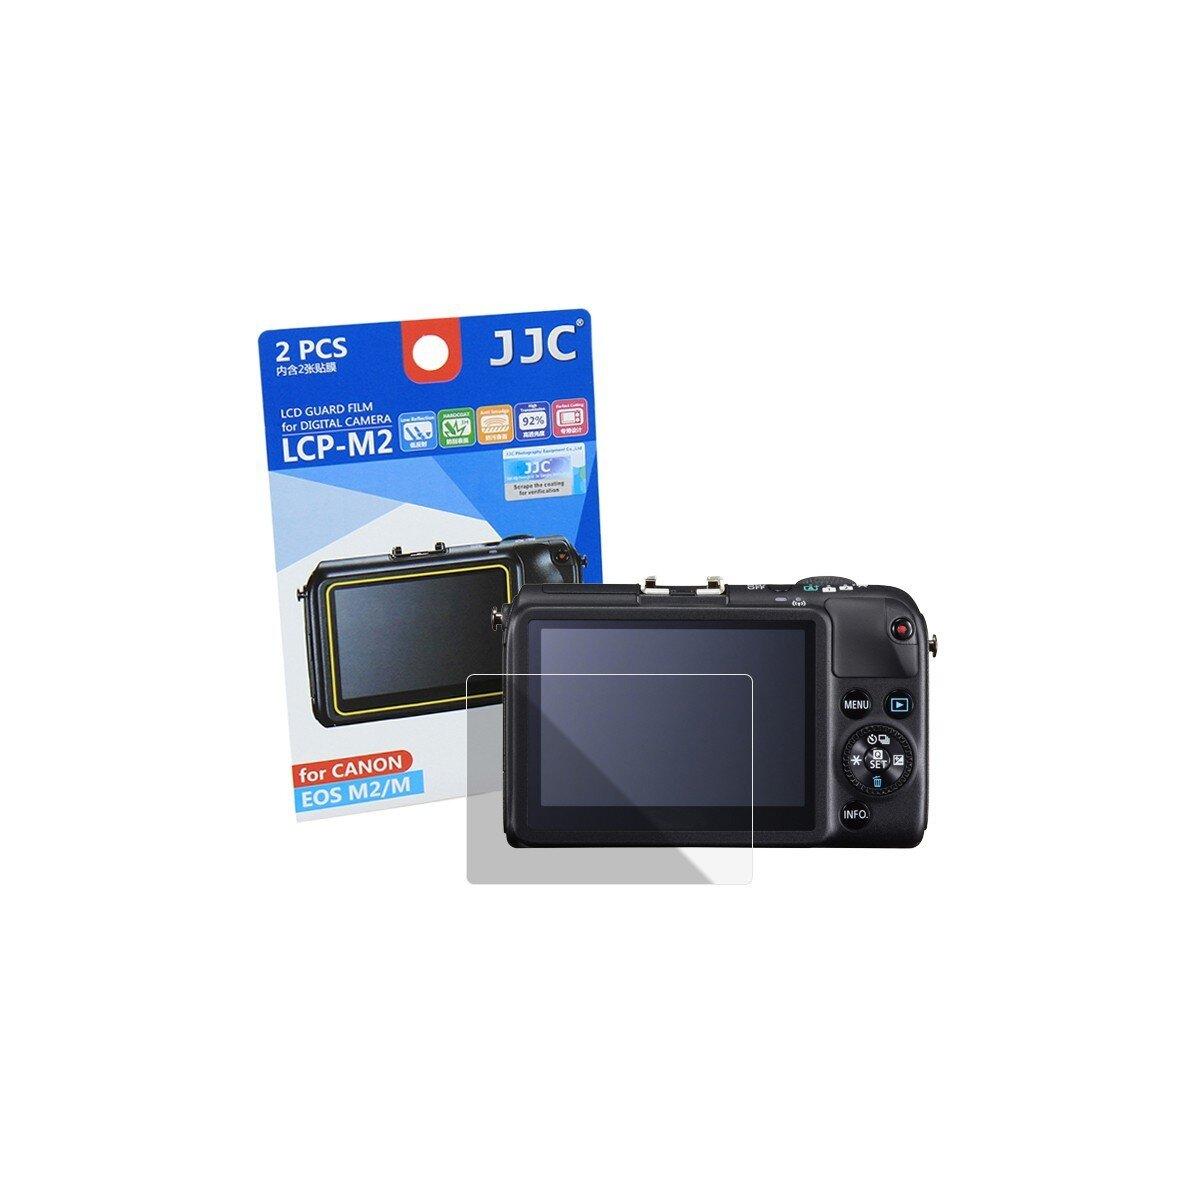 JJC LCP-M2 Displayschutzfolie Screen Protector Kratzschutz passgenau kompatibel mit Canon EOS M, M2